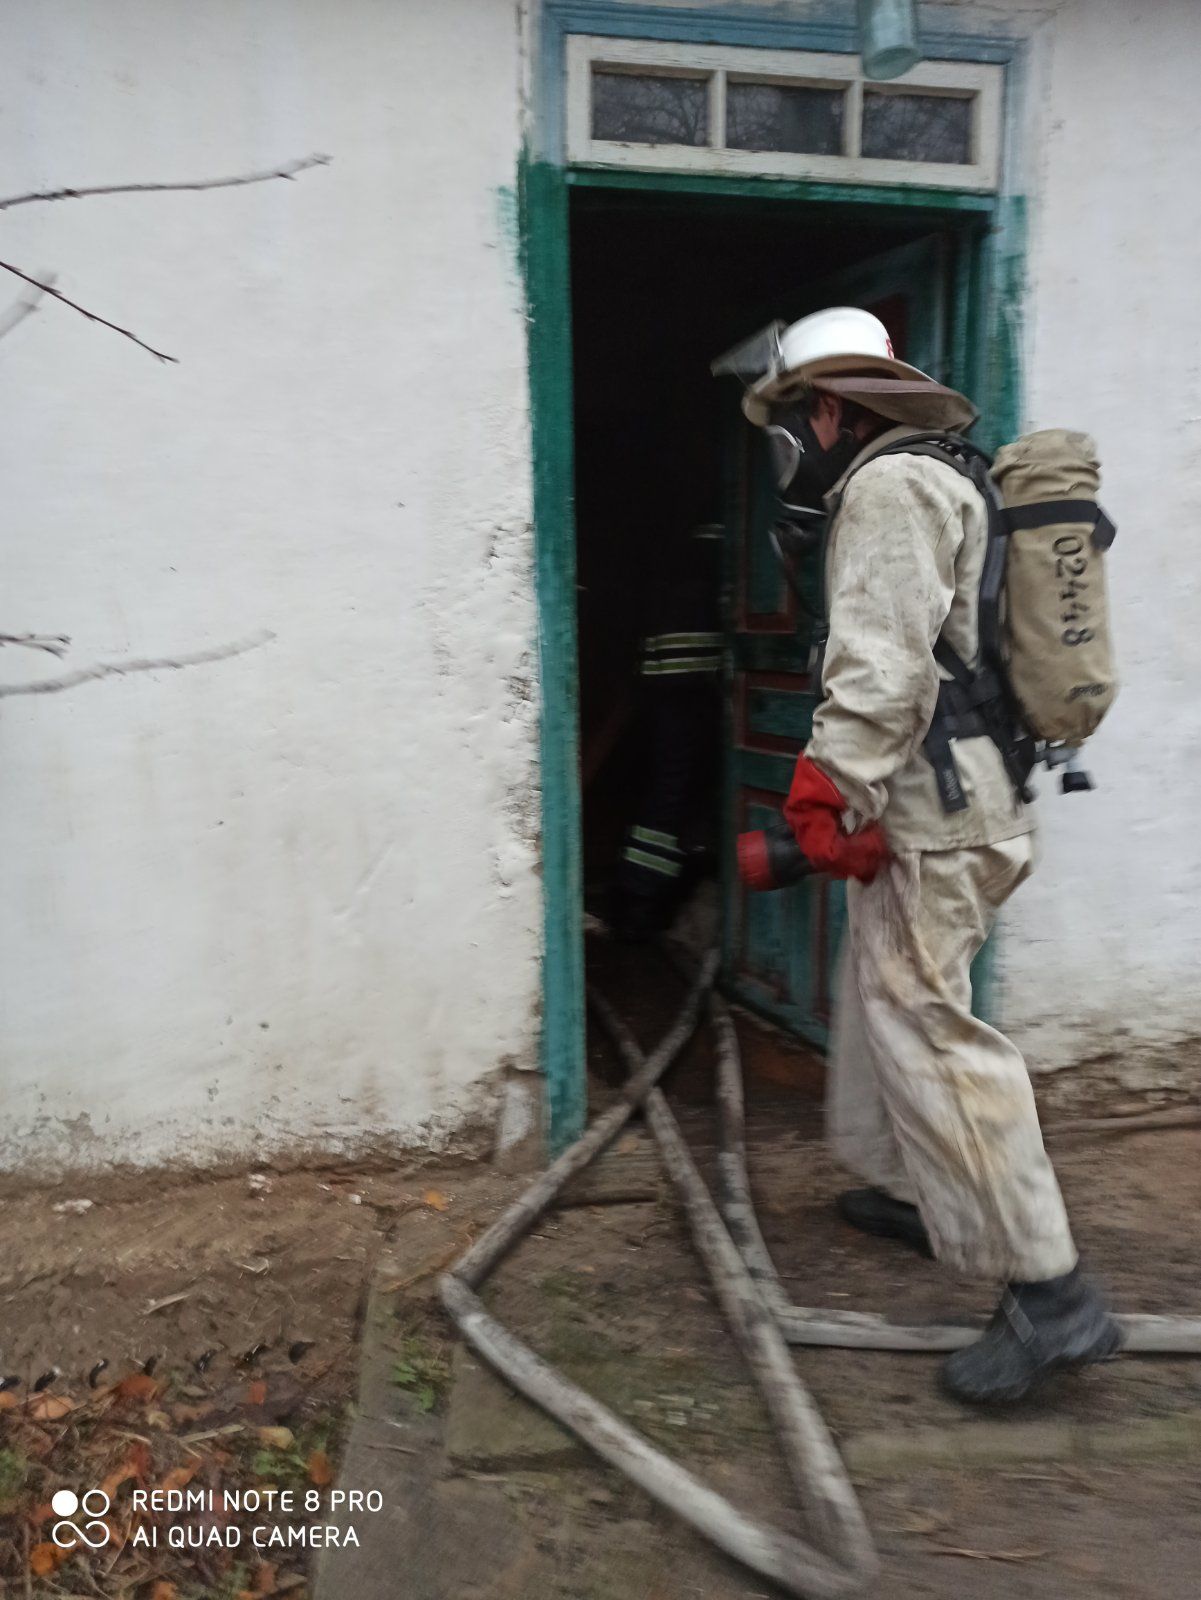 На Ставищенщині в пожежі загинув чоловік -  - IMG 455a65f38c39ccb507a7ac6b84e4c5f4 V